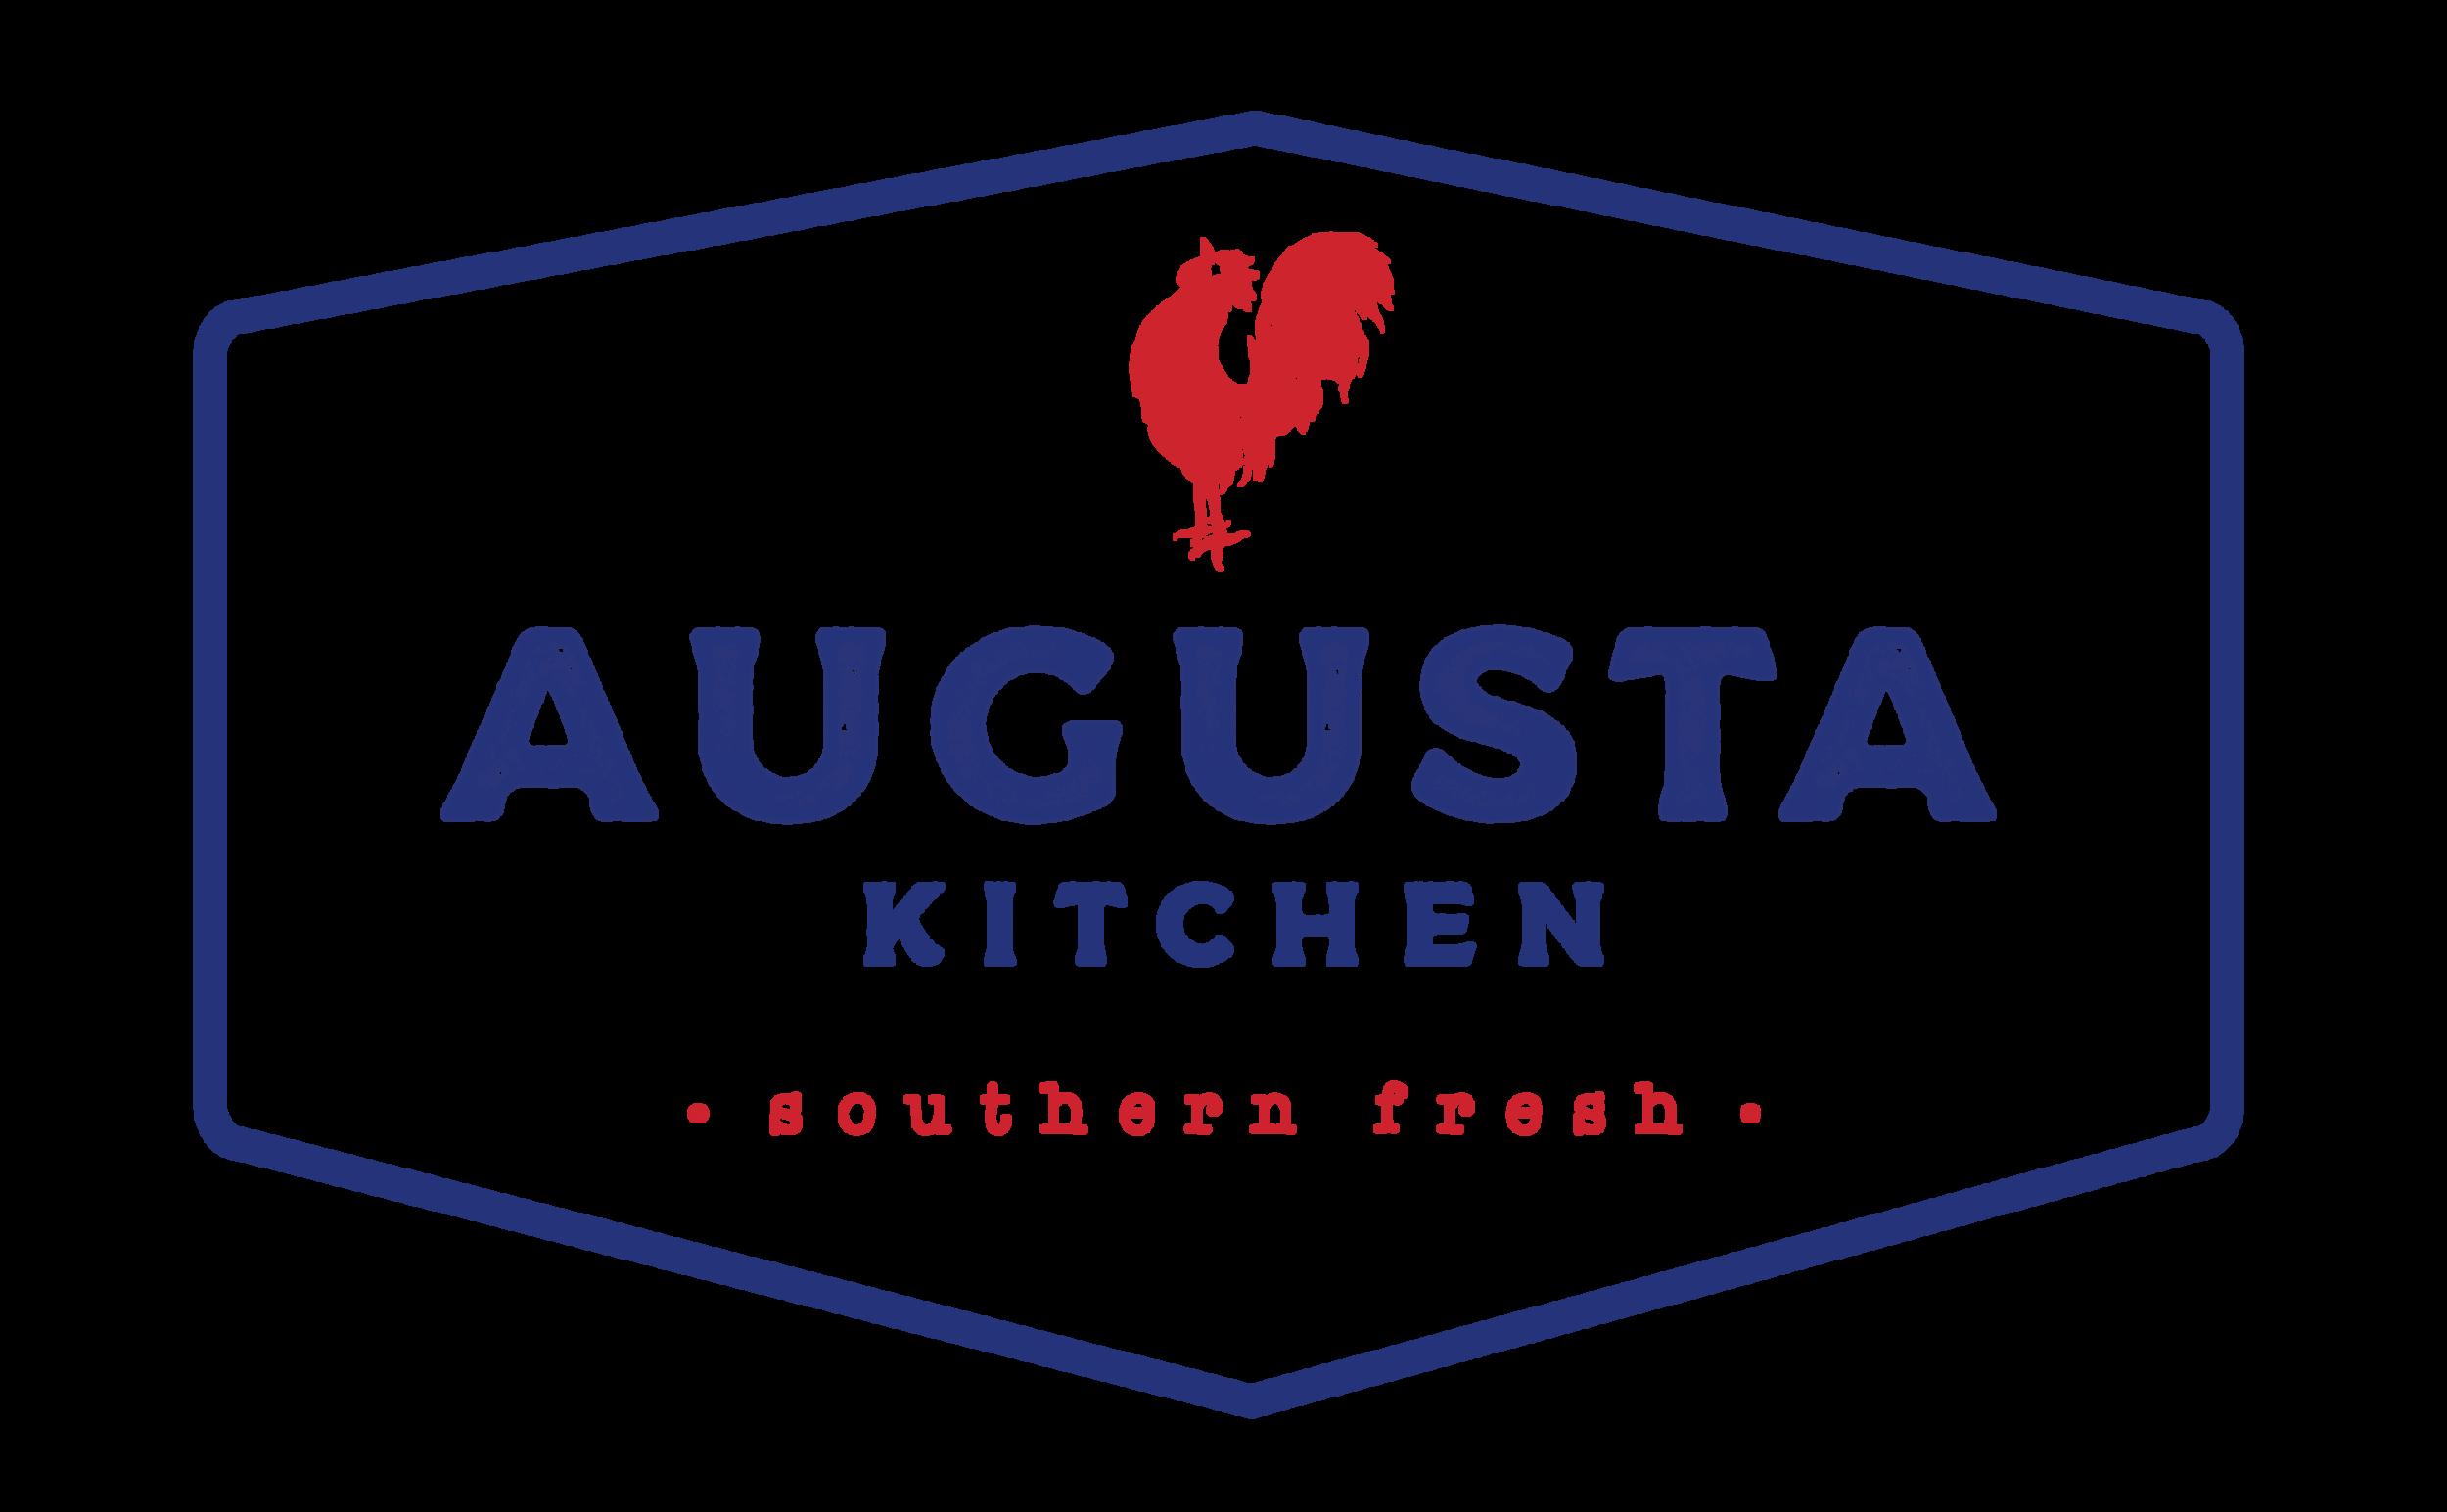 AugustaKitchen_Logo_AugustaKitchen_BlueAug.png